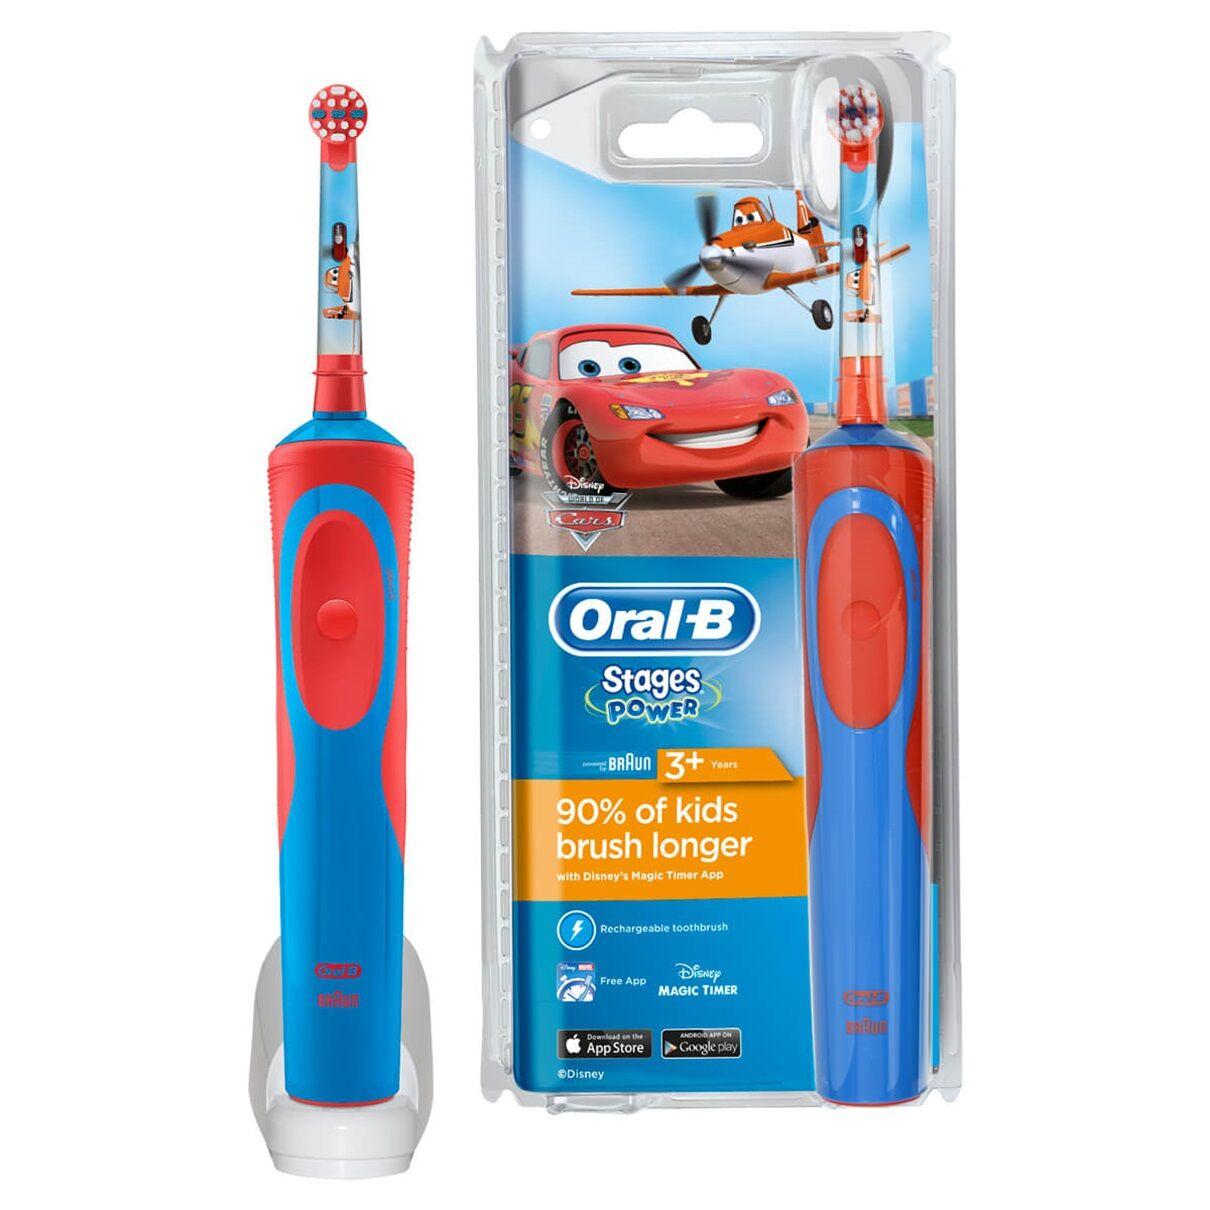 Procter & Gamble Oral B Stages power vitality Spazzolino elettrico Cars per bambini 3+ anni